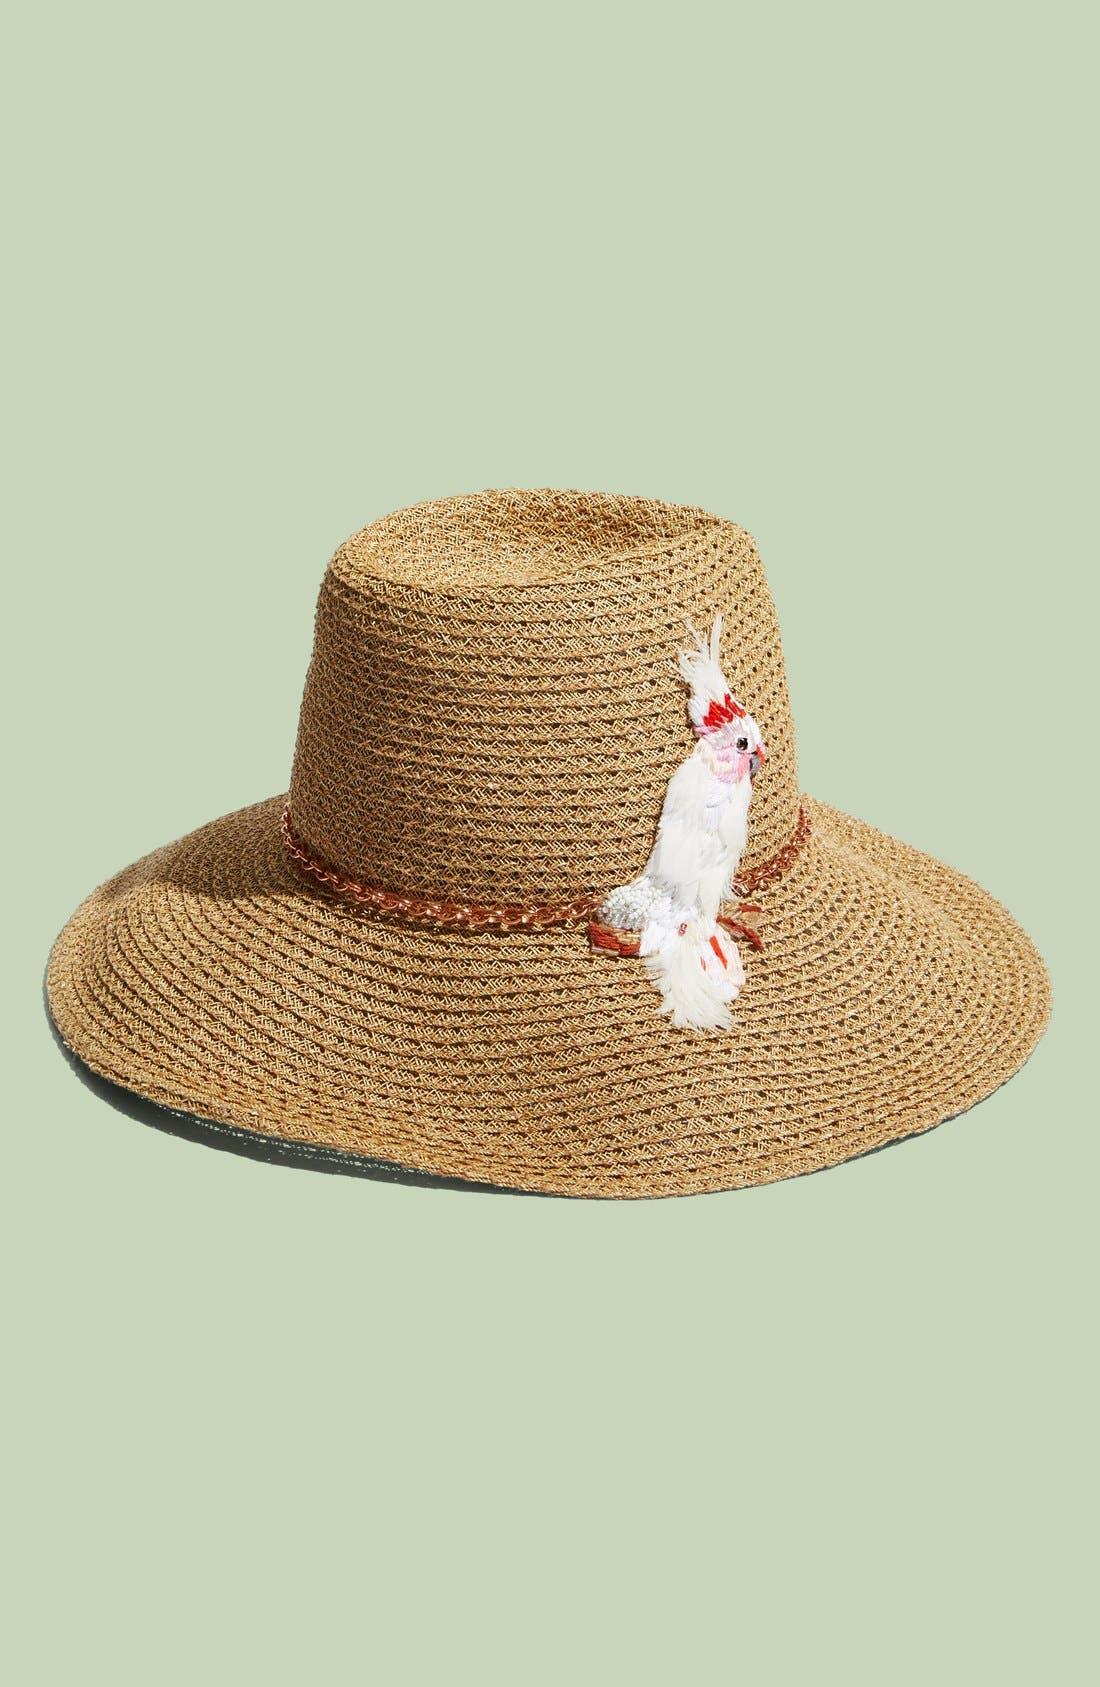 'Emmanuelle' Cockatoo Ornament Straw Hat,                             Main thumbnail 1, color,                             250